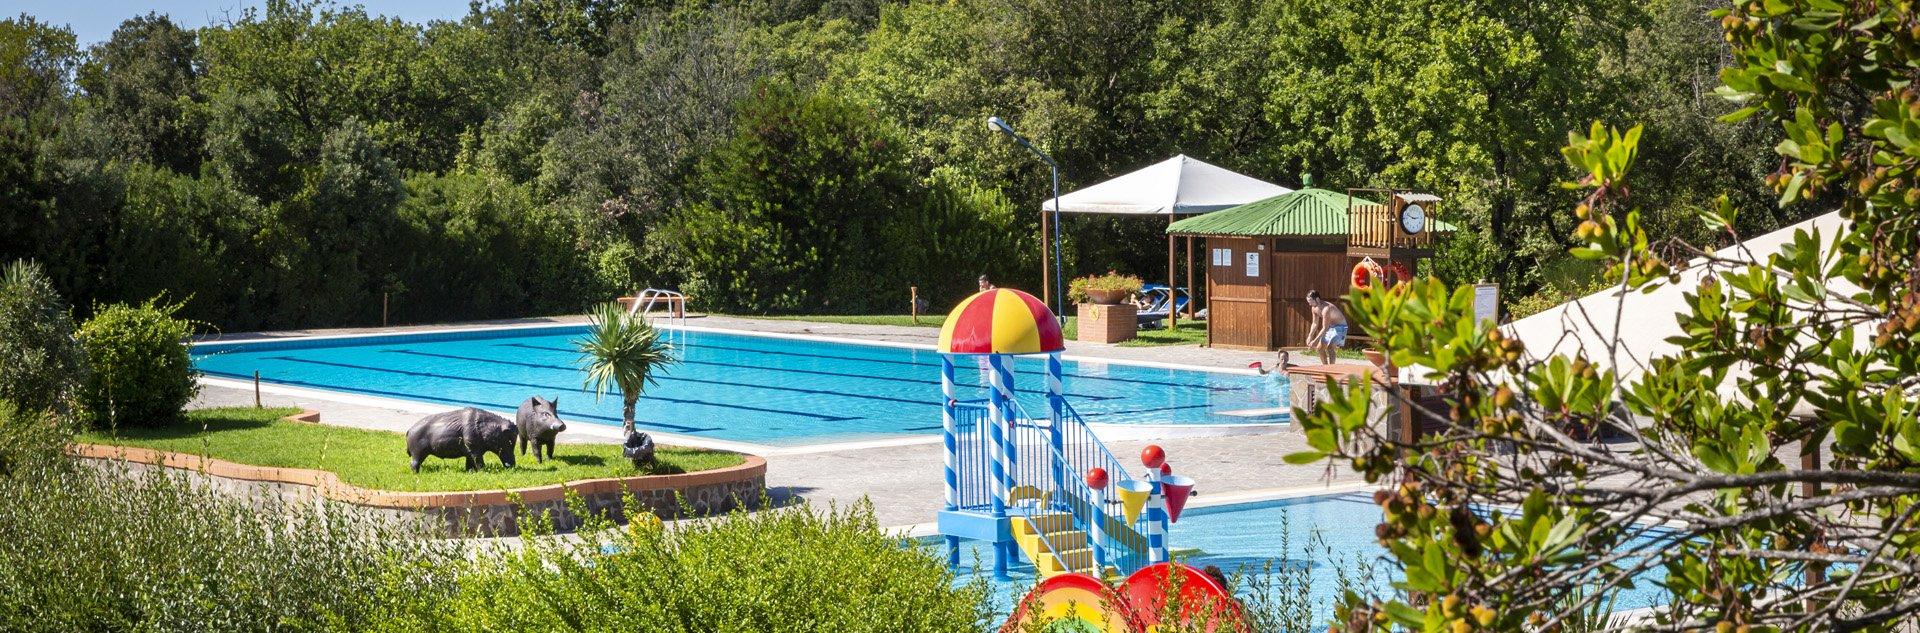 banner montescudaio -  zwembad